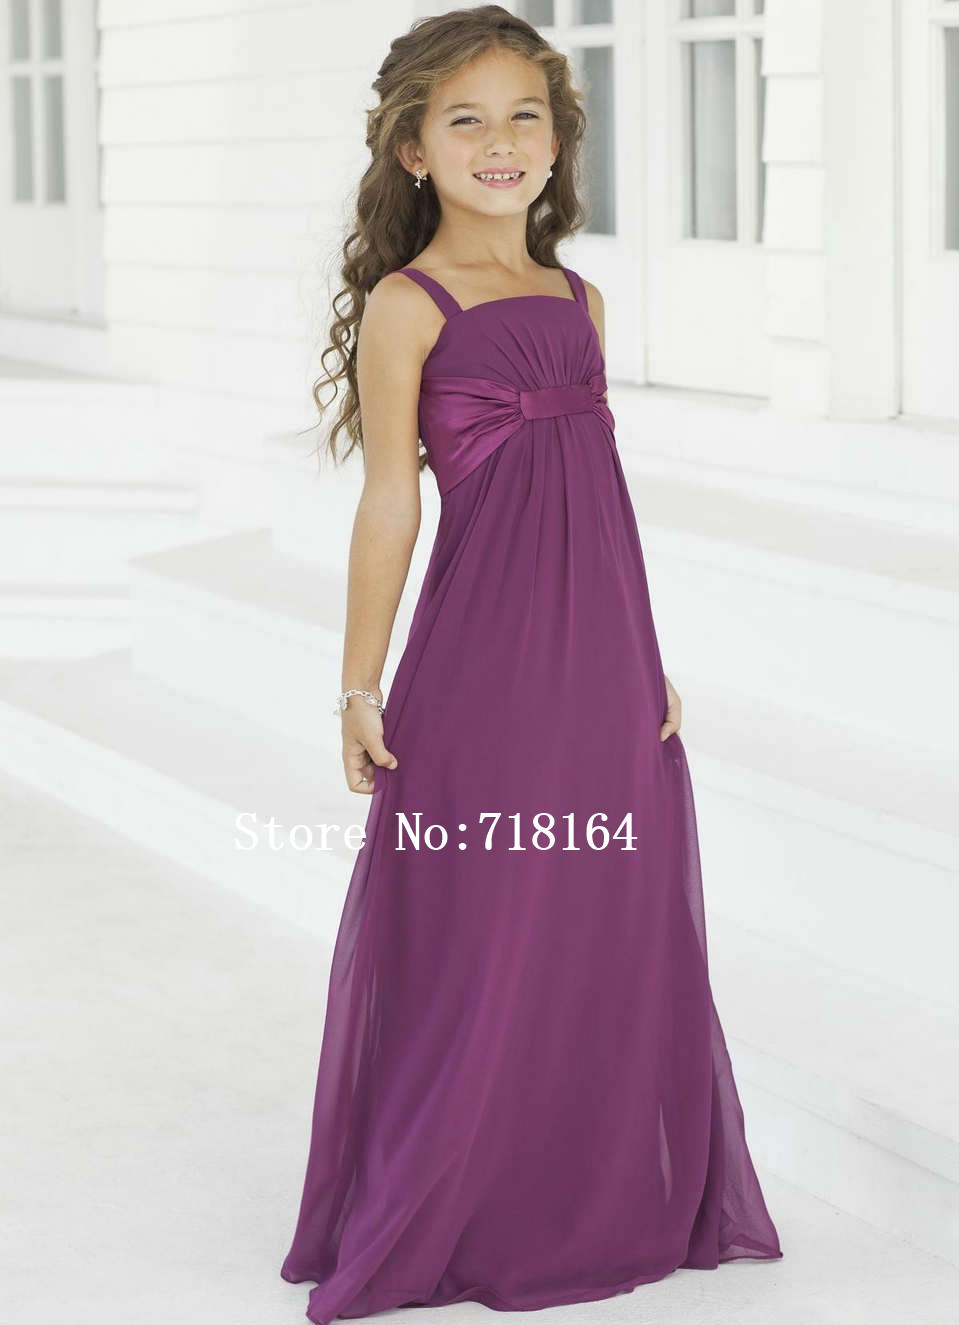 Girls Bridesmaid Dress - Wedding Dress Ideas